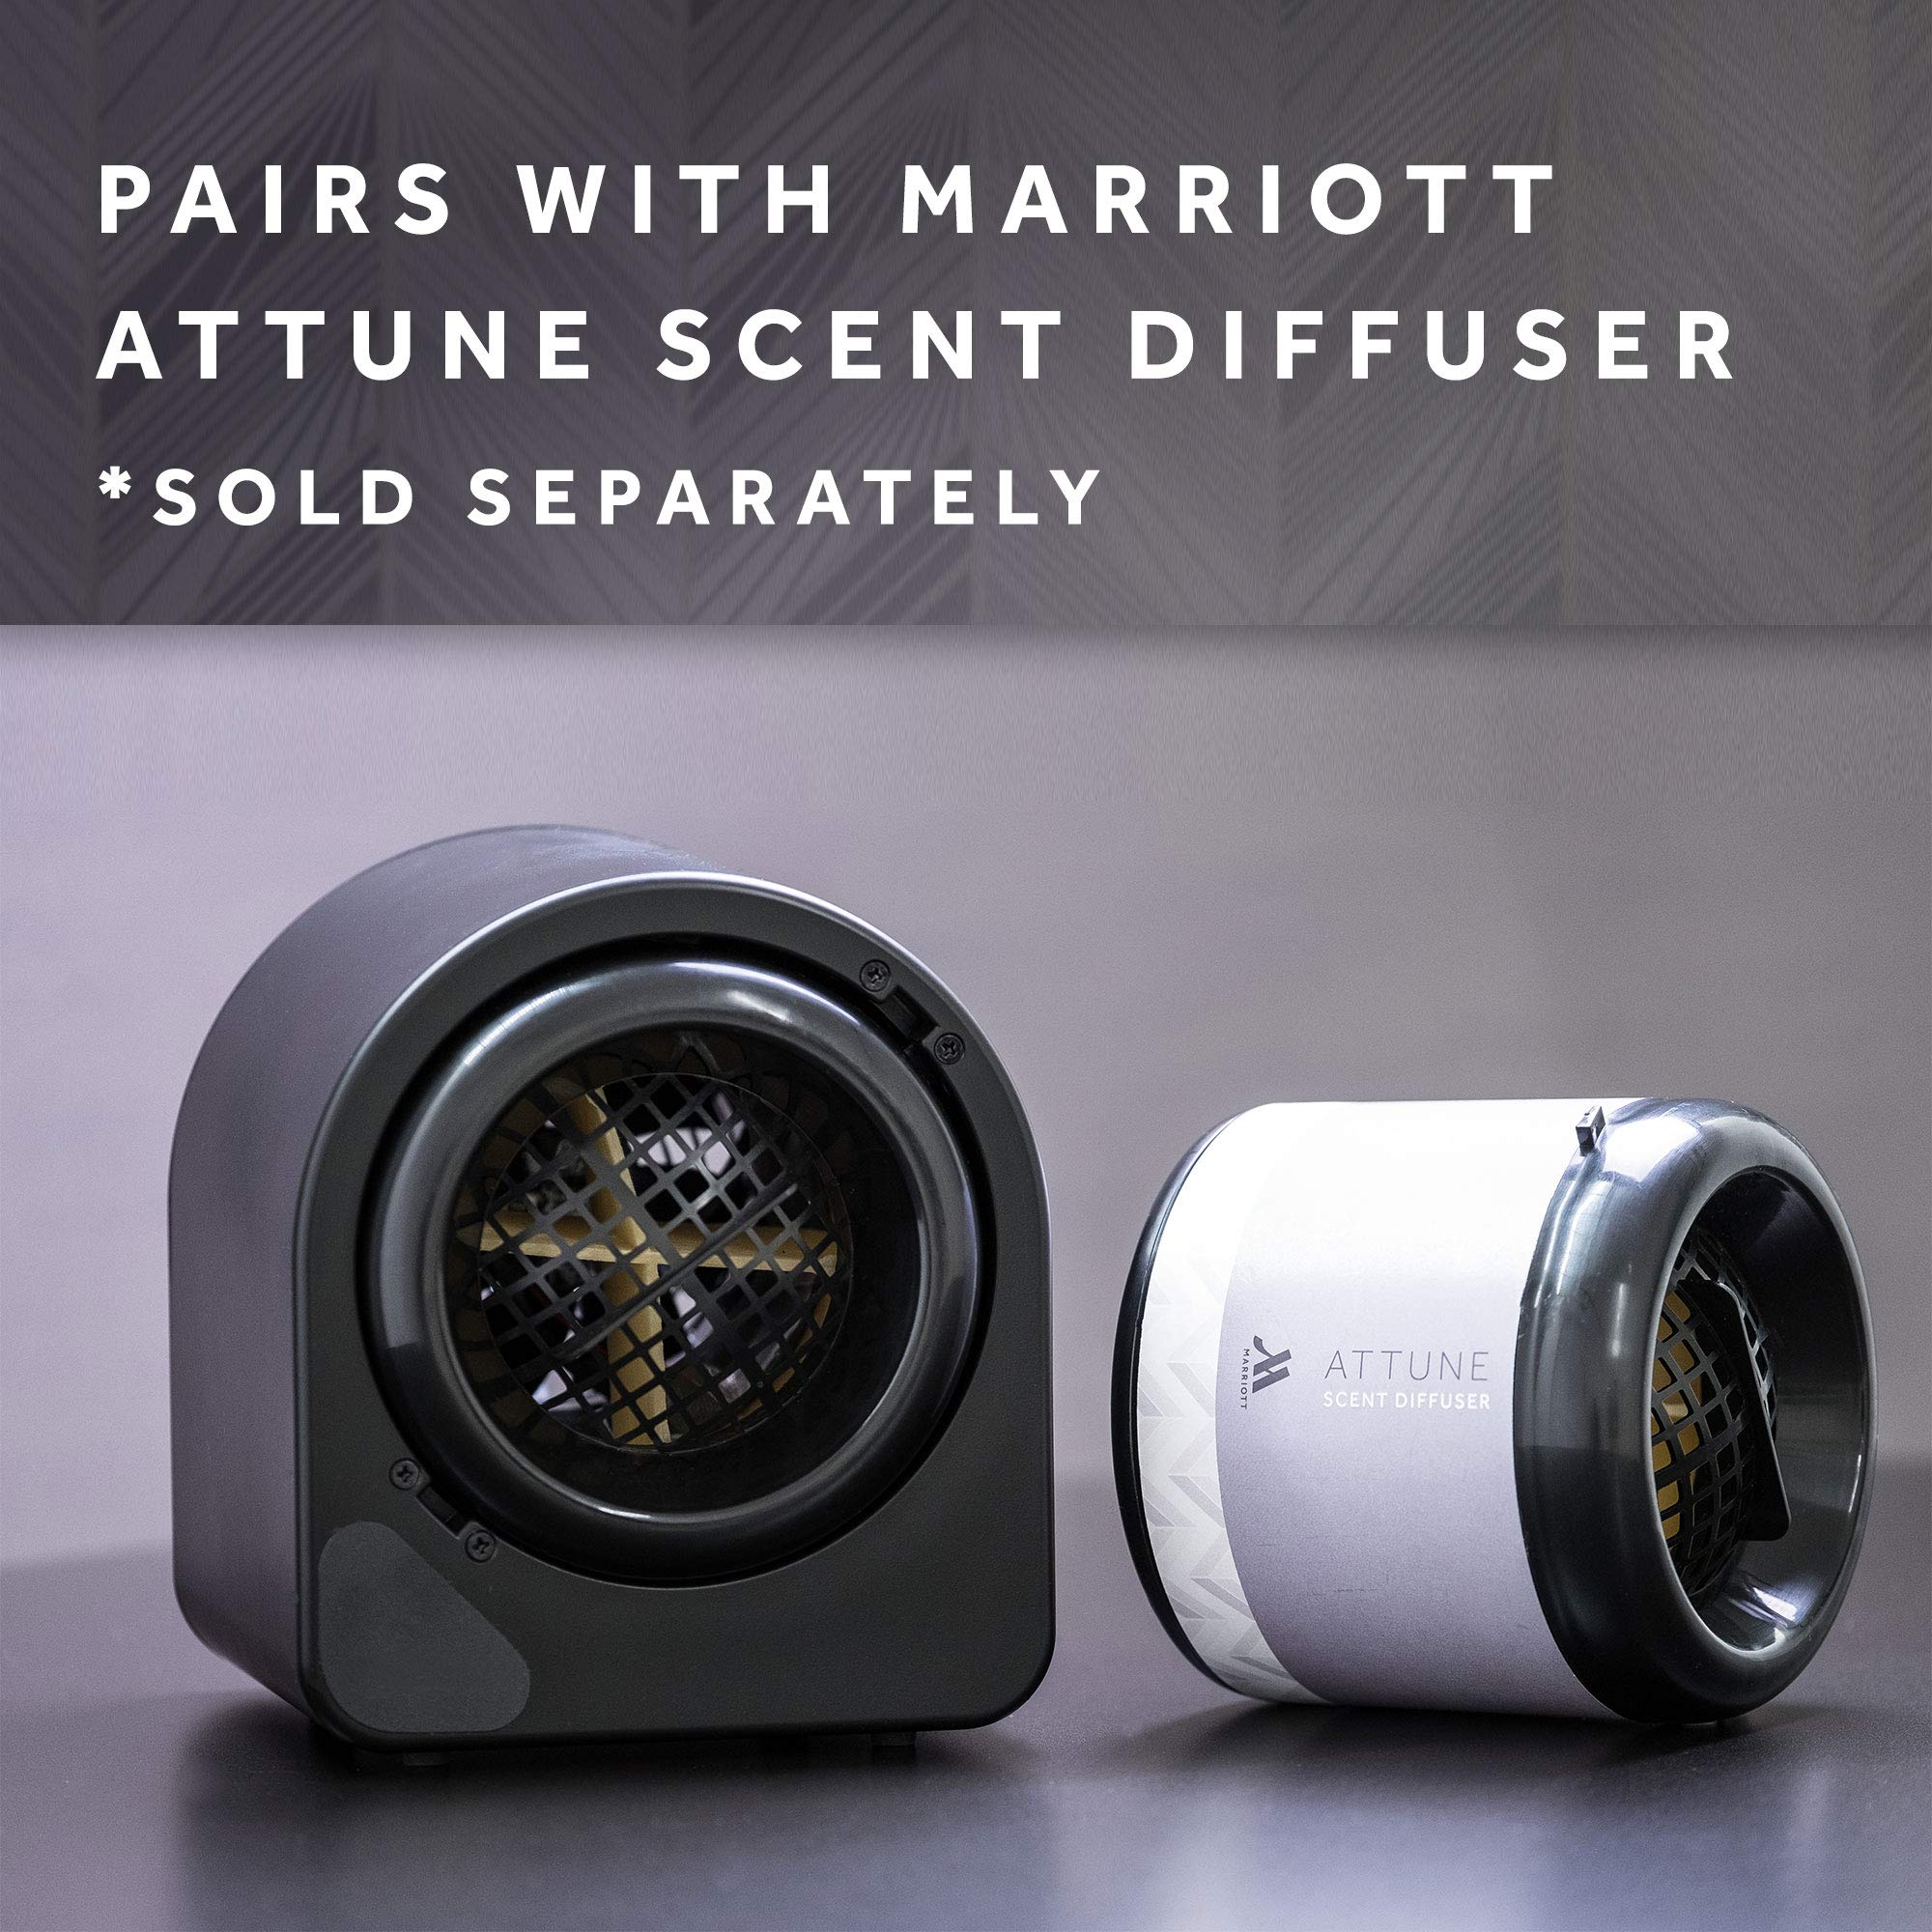 Marriott Attune Scent Diffuser Refill Cartridge - 1 Refill Cartridge Hotels Scent Machine with Signature Attune Scent by Marriott (Image #4)